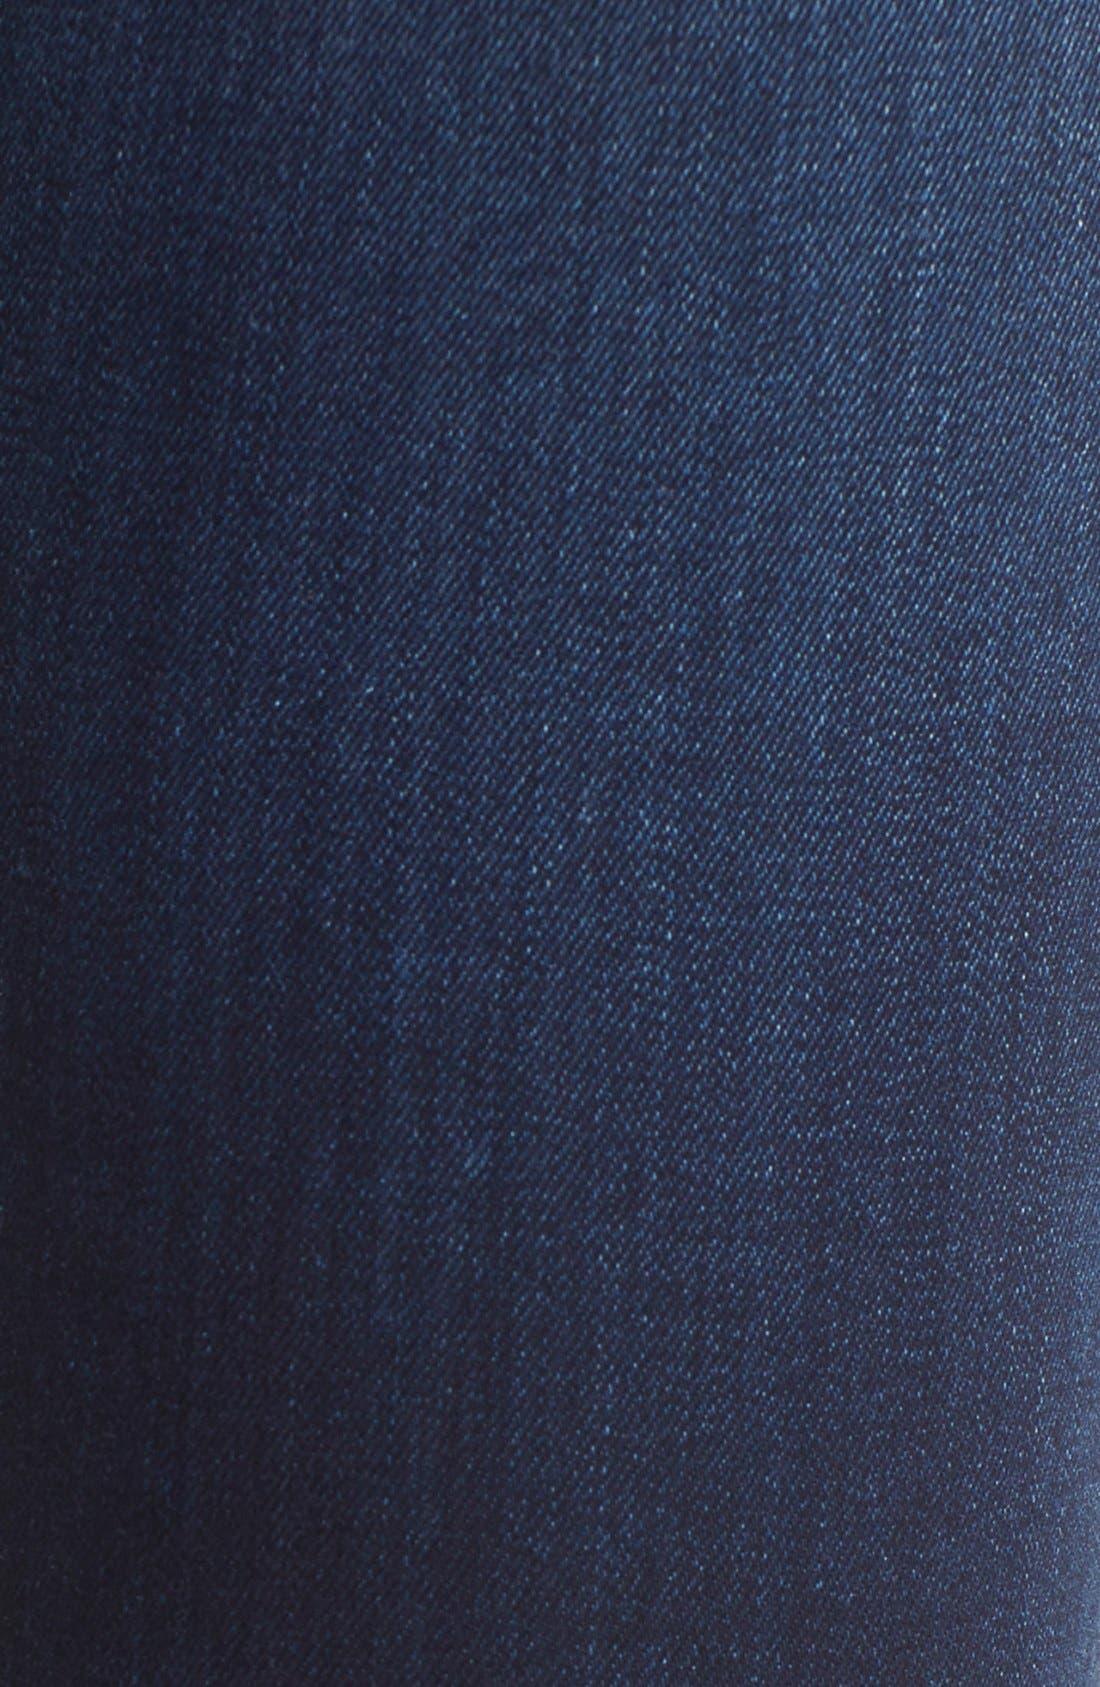 'Krista' Release Hem Jeans,                             Alternate thumbnail 2, color,                             402